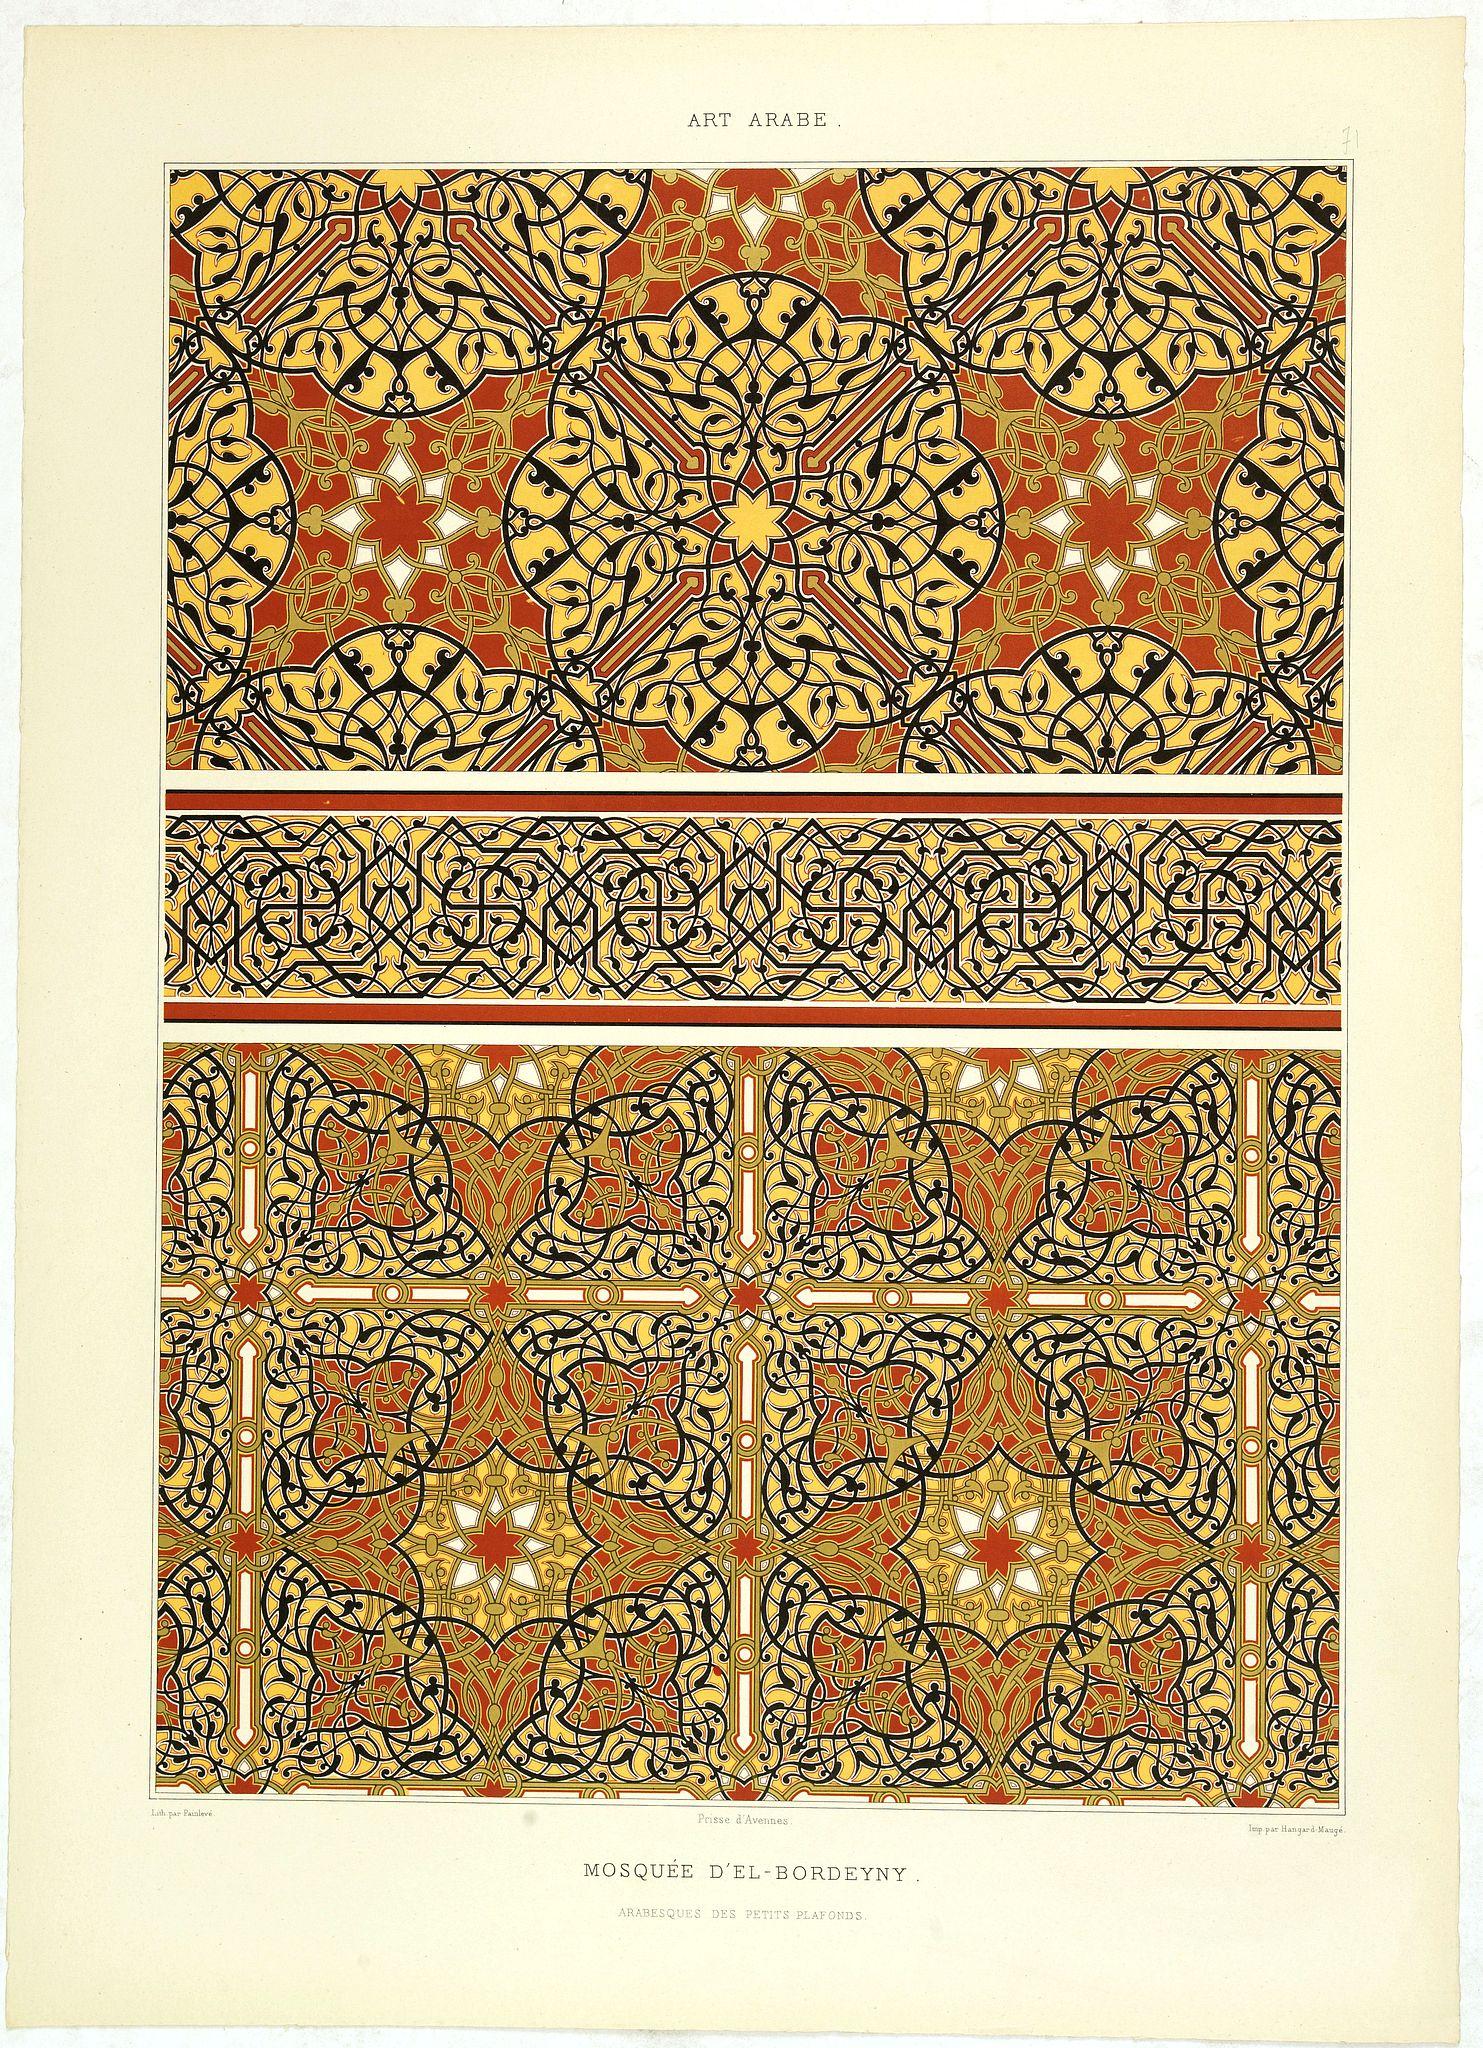 PRISSE D'AVENNES, E. -  Art arabe. - Mosquée d'El-Bordeyny.